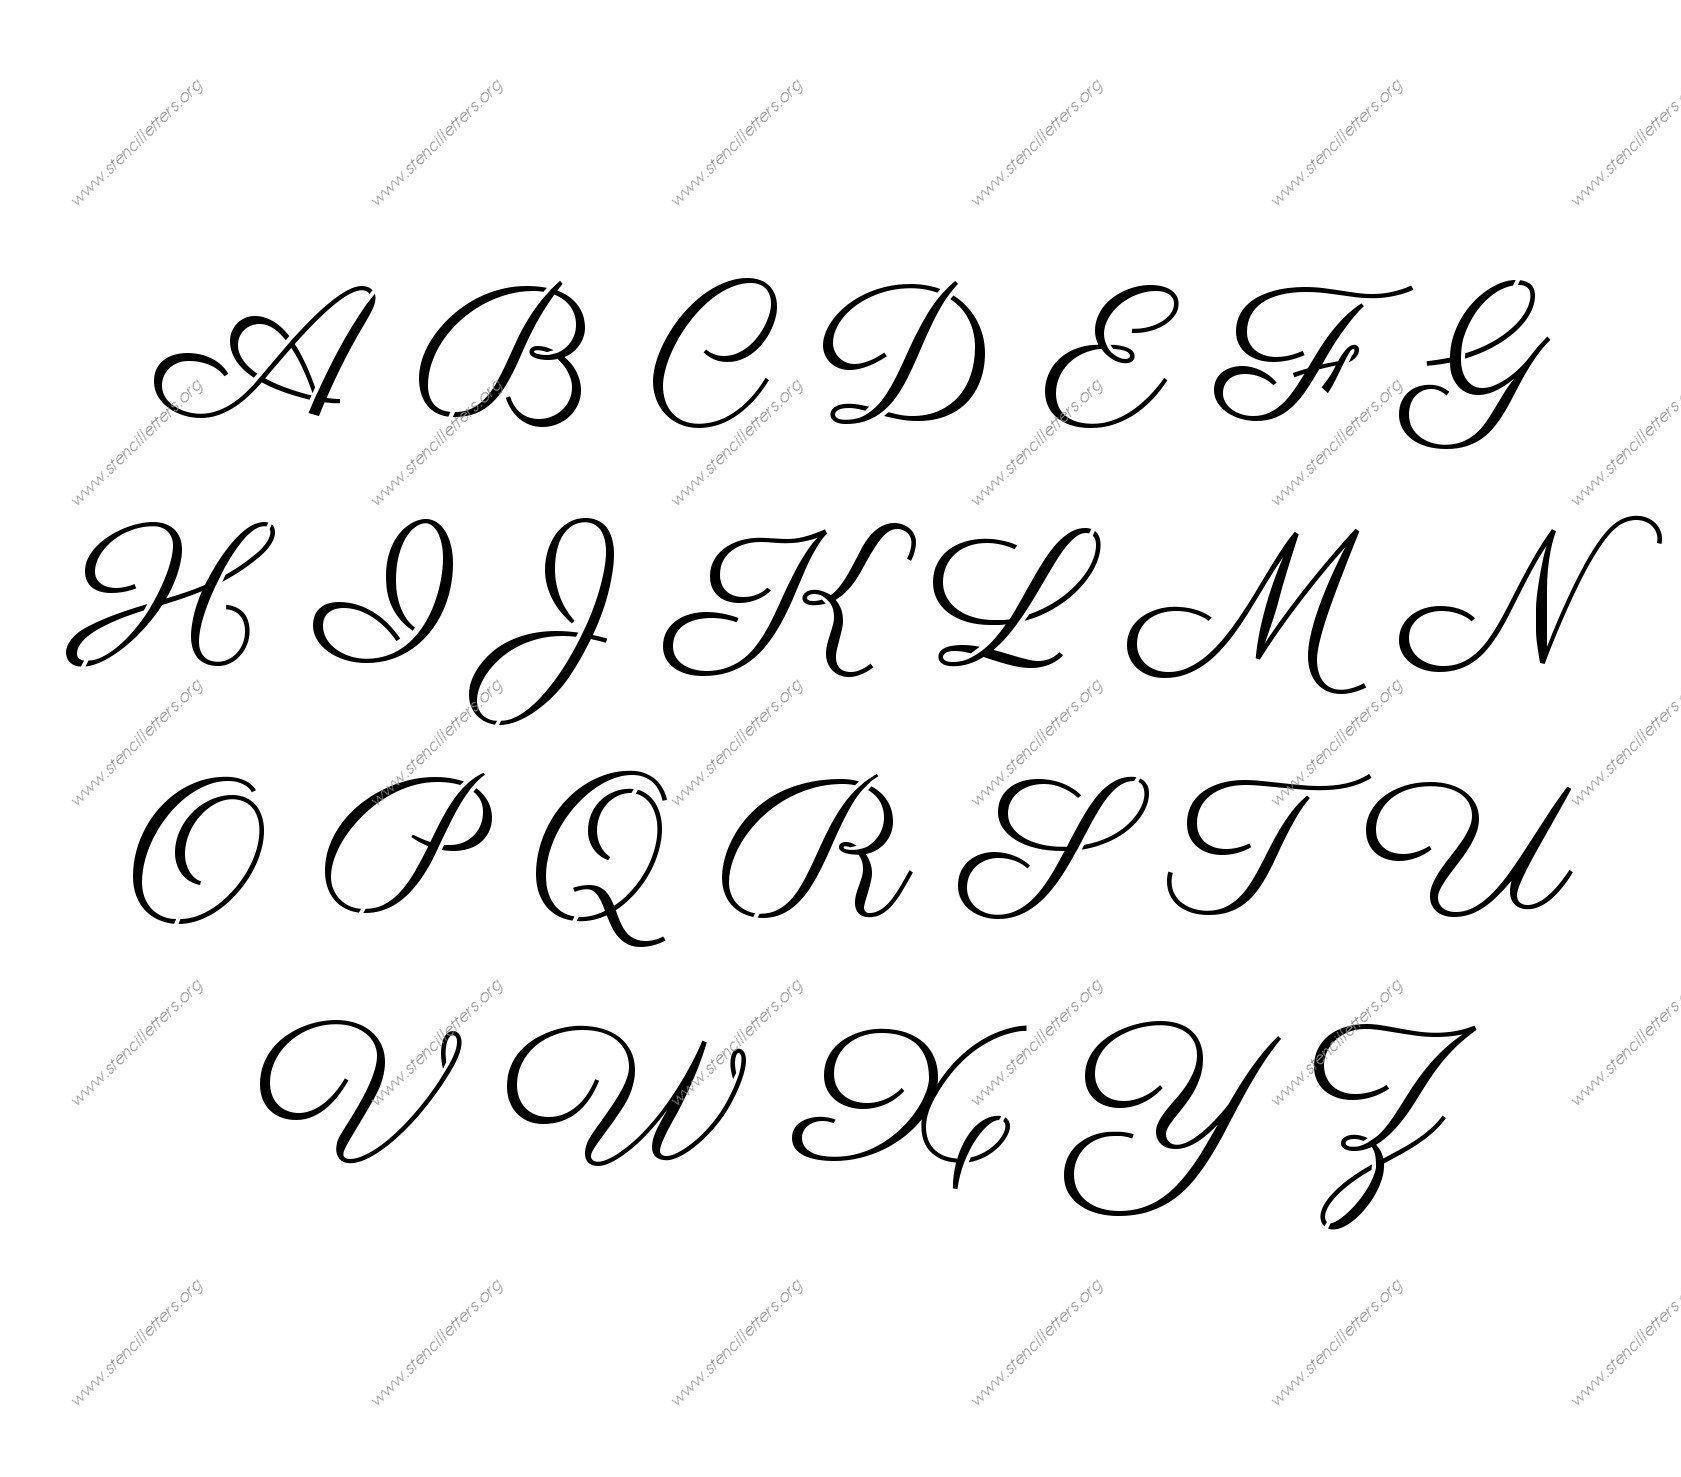 Free Printable Alphabet Stencil Letters Template | Art & Crafts - Free Printable Alphabet Stencils Templates